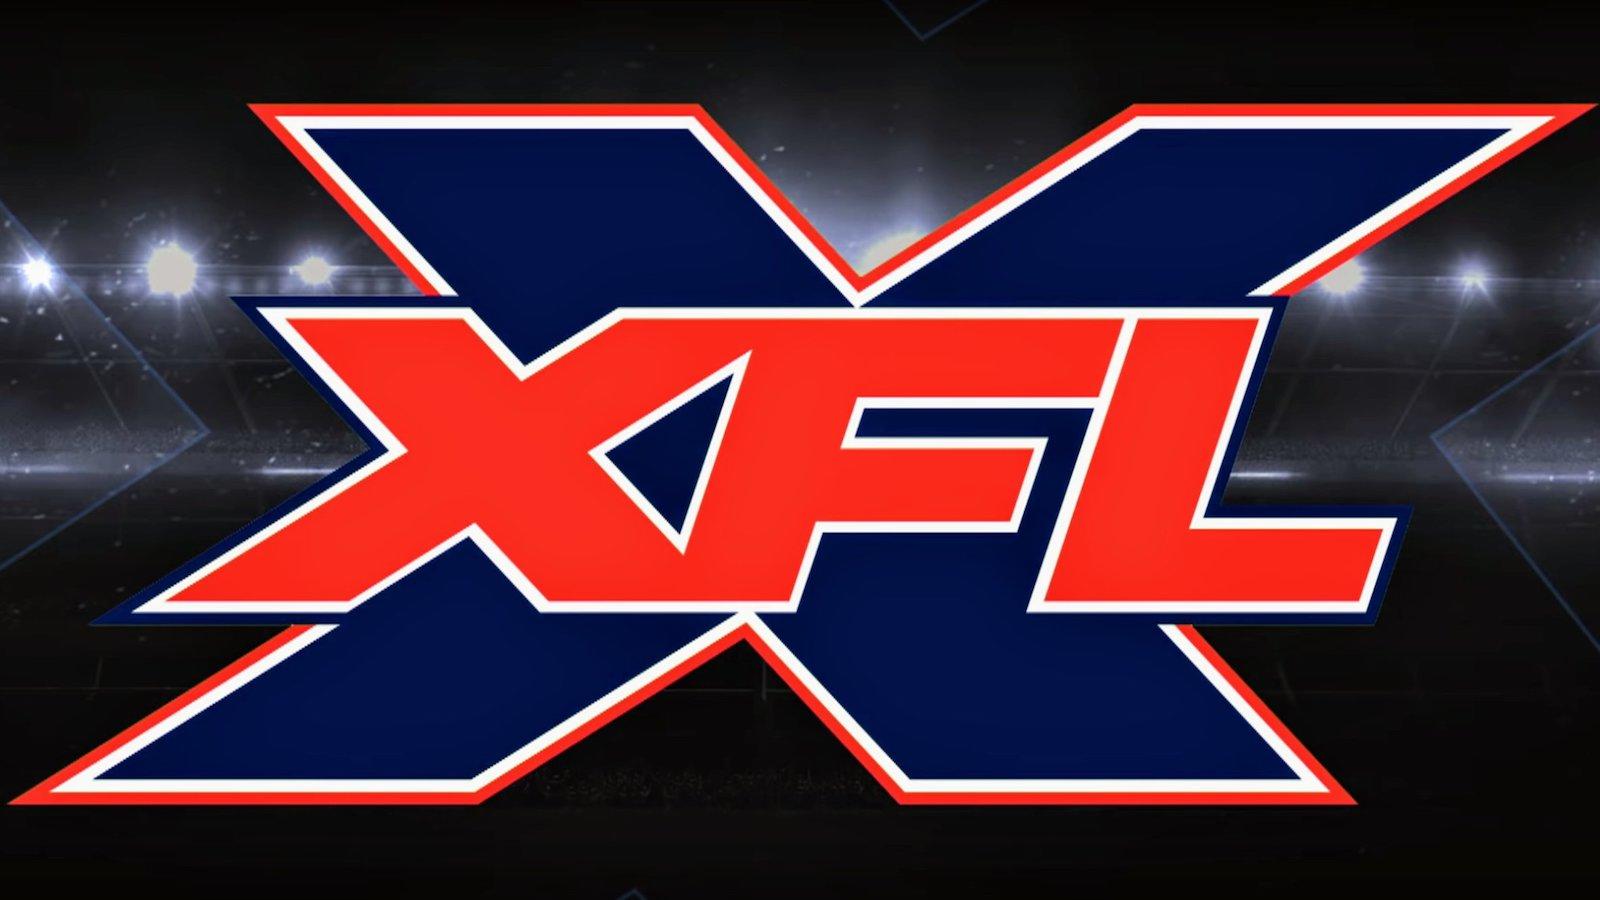 Weekend Roundup: XFL Lawsuit Update, NXT India Update, Candice Michelle, AEW & Miami Update, Dalton Castle, Indies